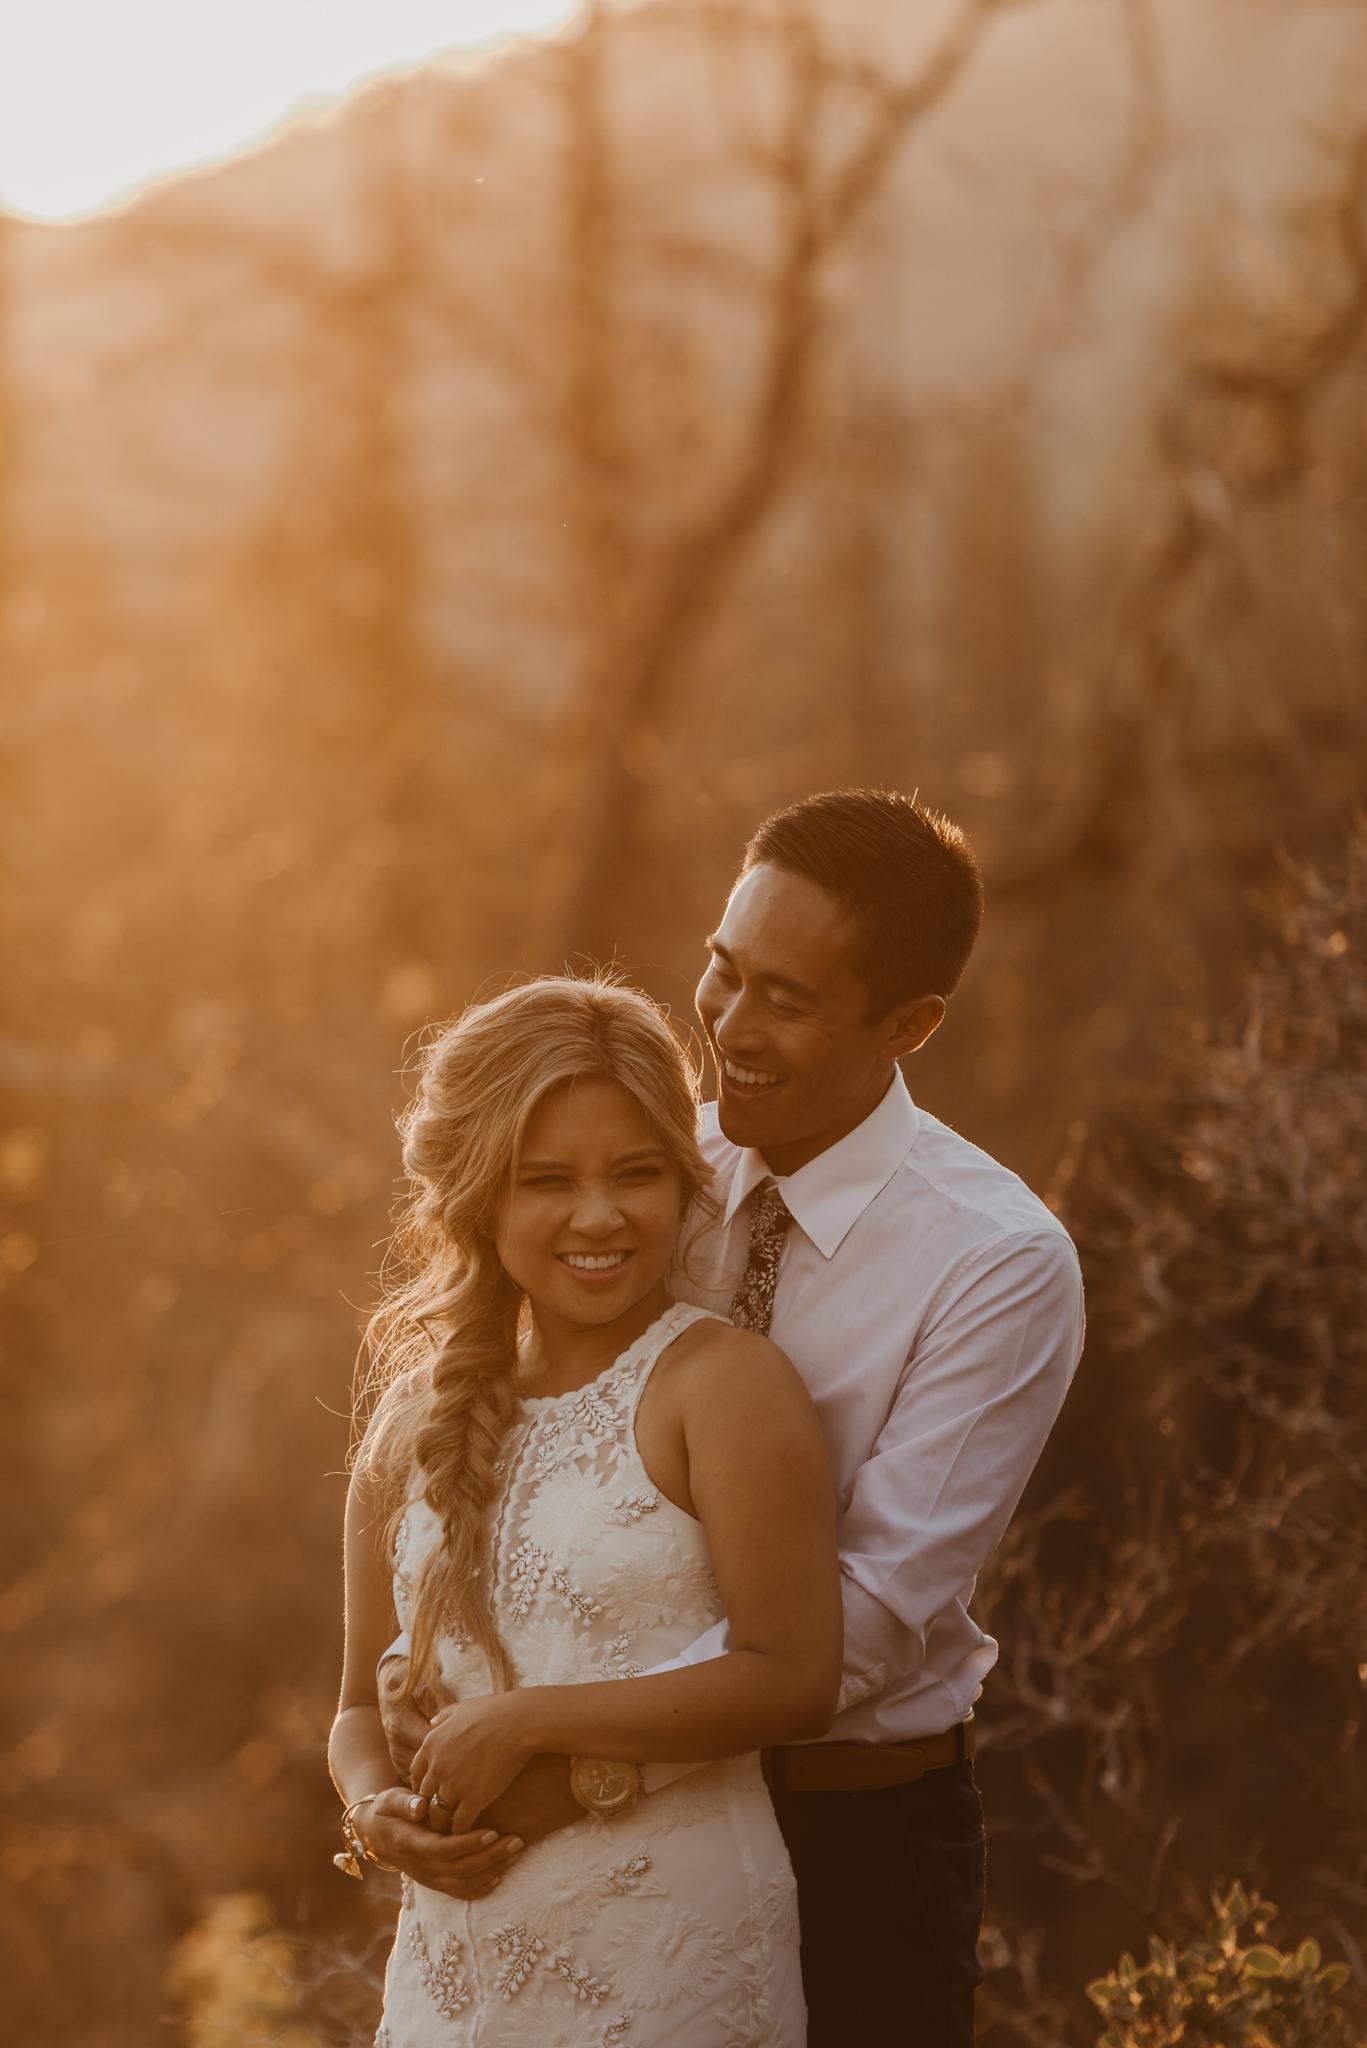 © Isaiah + Taylor Photography - Evergreen Lodge Destination Yoesmite Wedding - Los Angeles Wedding Photographer-222.jpg